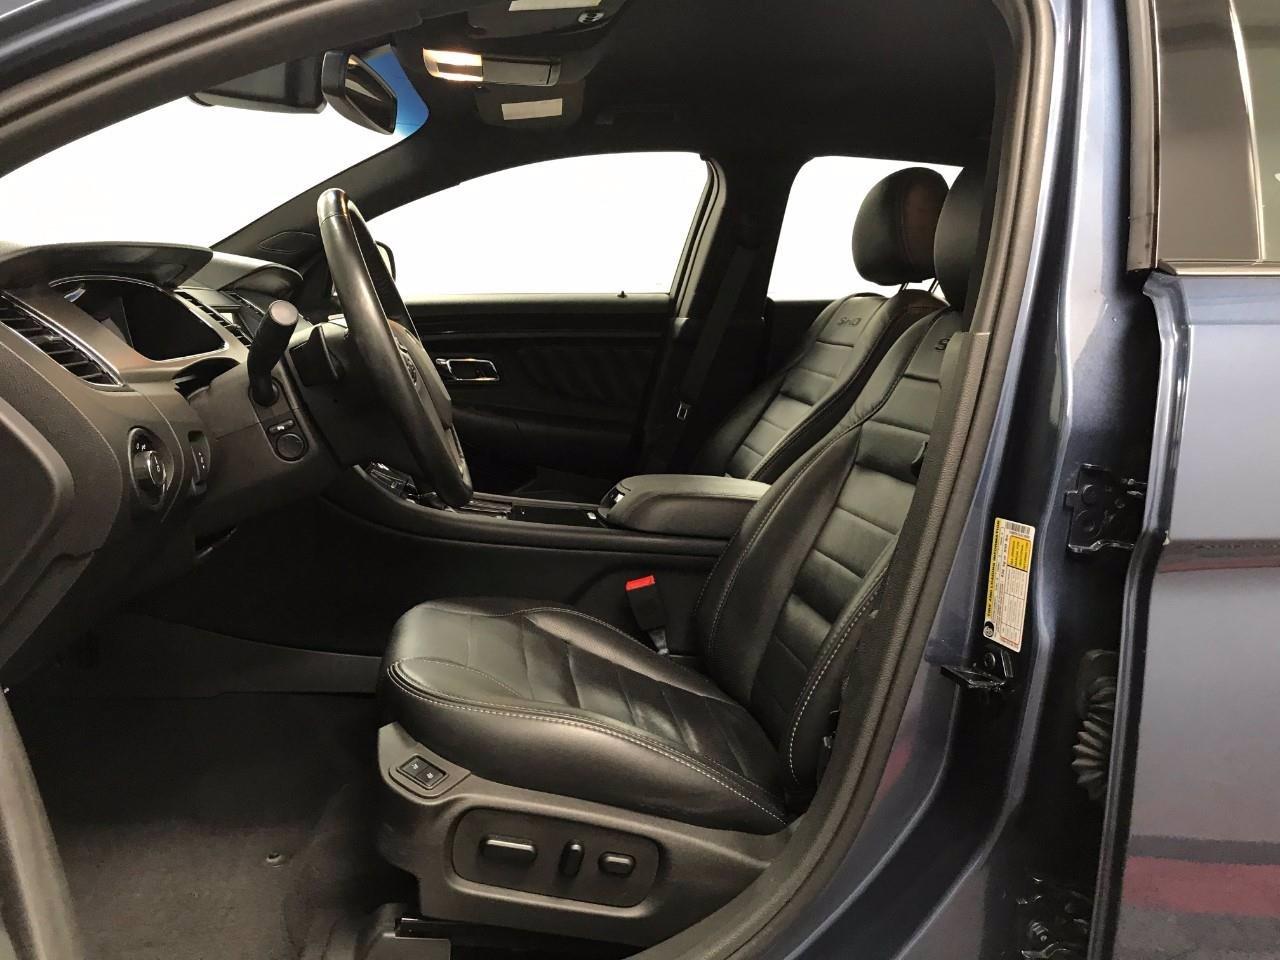 2018 Ford Taurus SHO